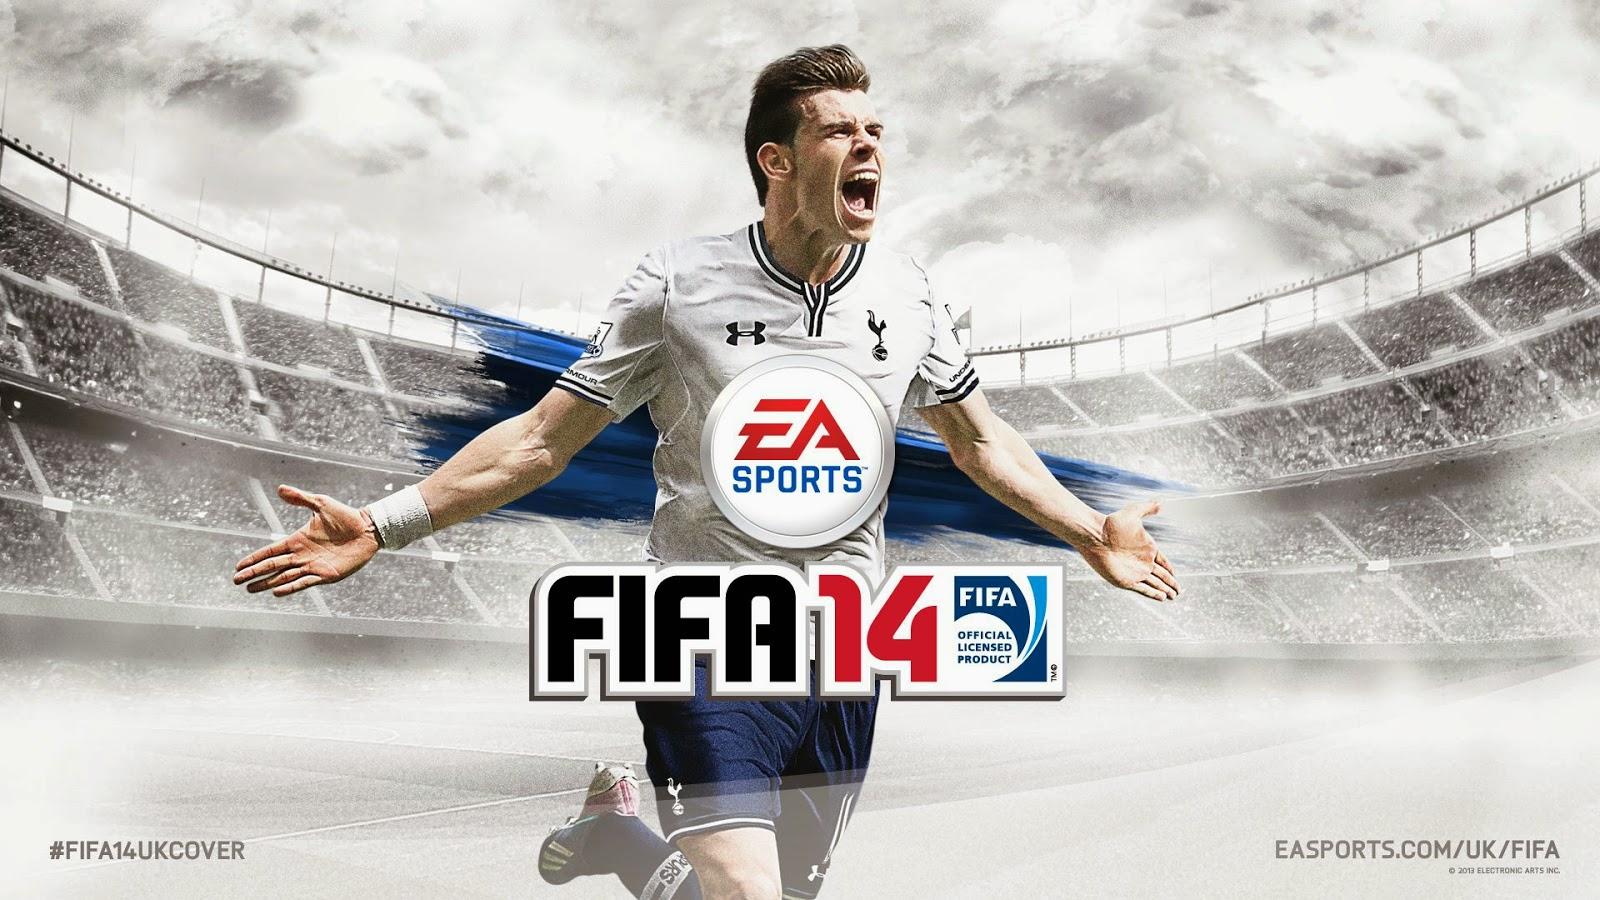 FIFA Football 2002 Full Version Free Download - Game Menia